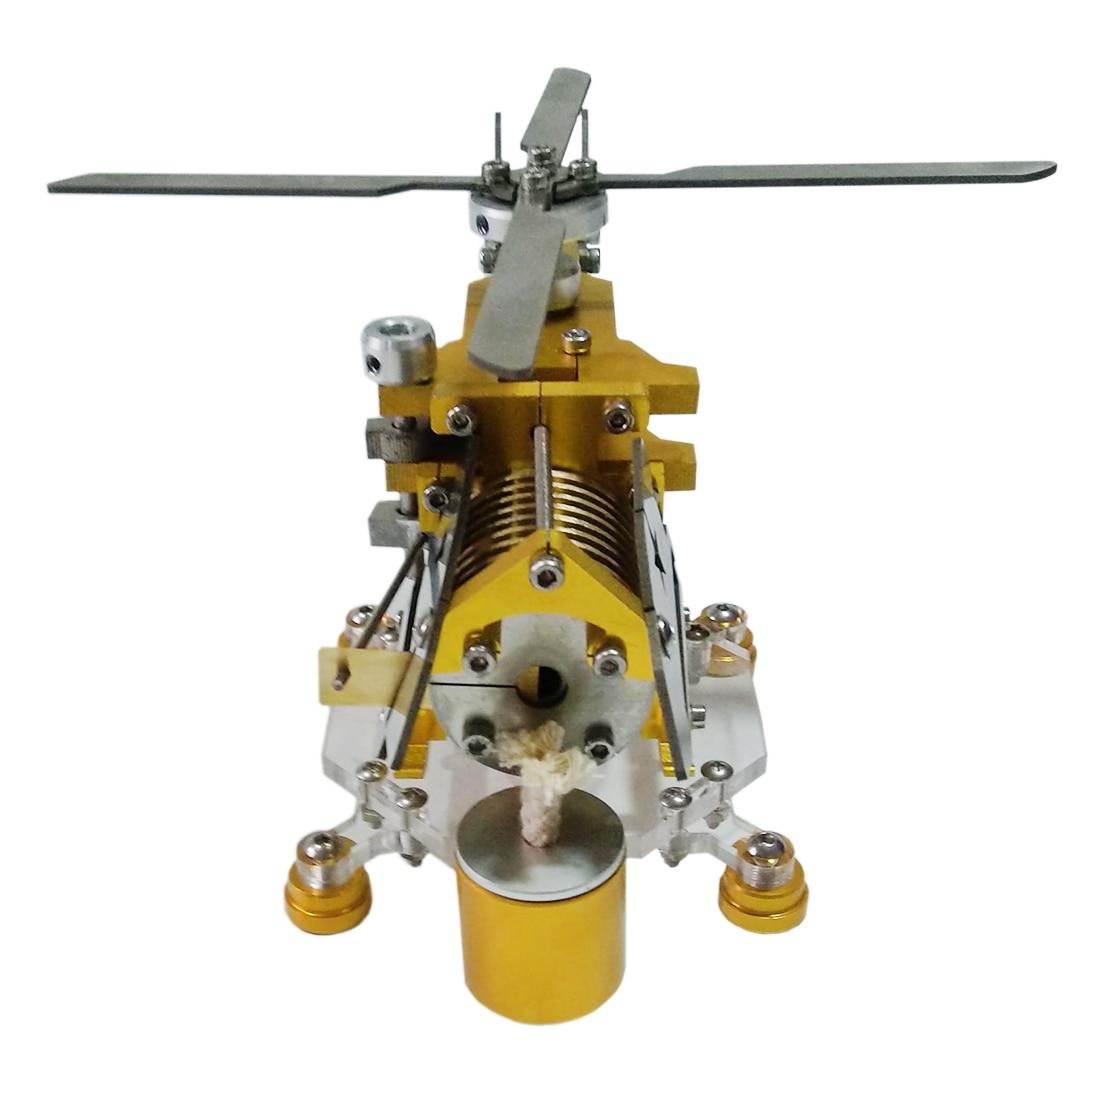 Transport Helicopter Horizontal Single Cylinder Vacuum Stirling Engine Model Kits Toys Model Building Kits Toys For Children